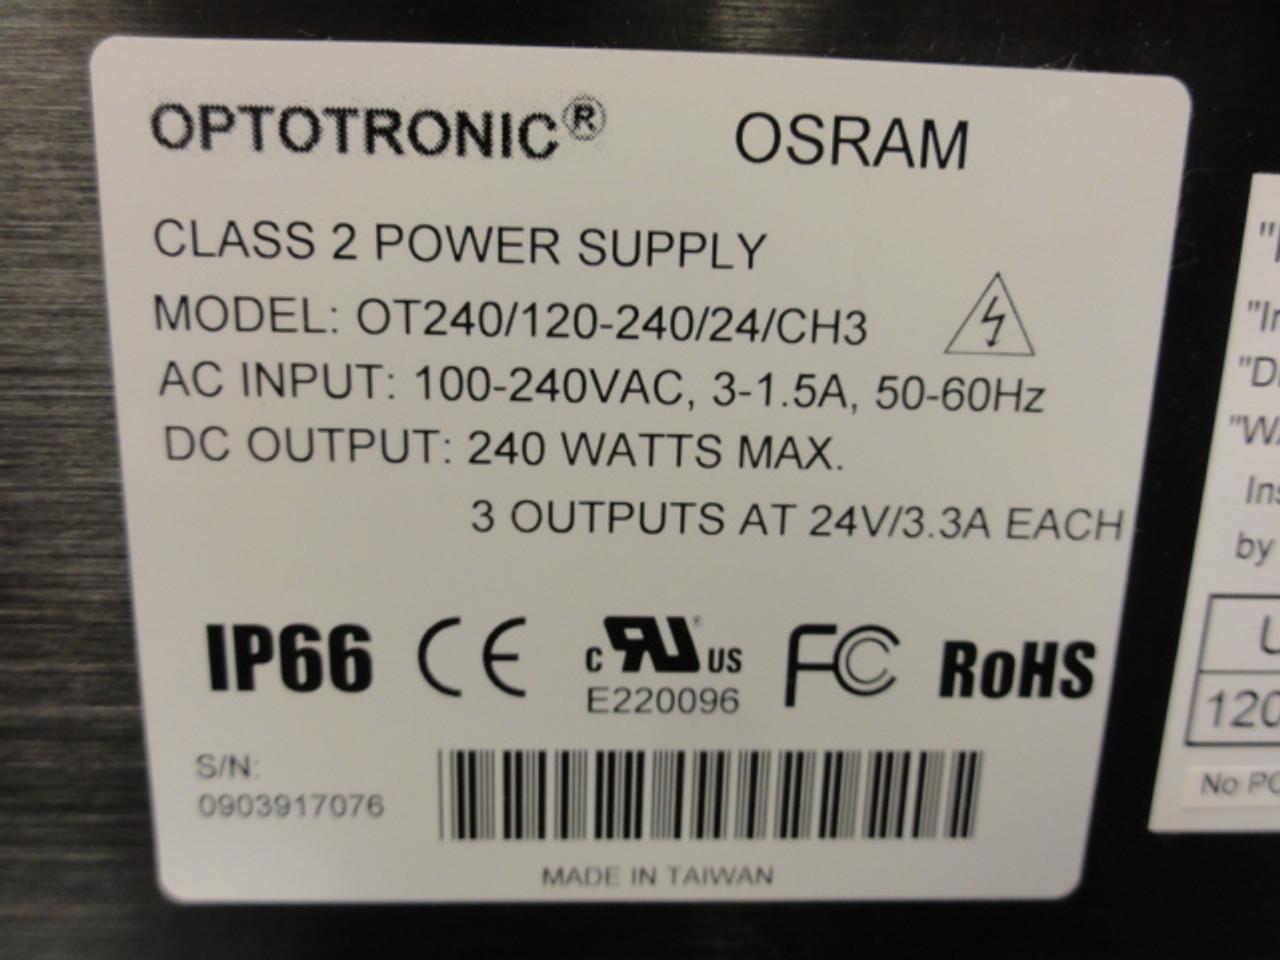 Optotronic OSRAM OT240/120-240/24/CH3 Class 2 Power Supply - NEW